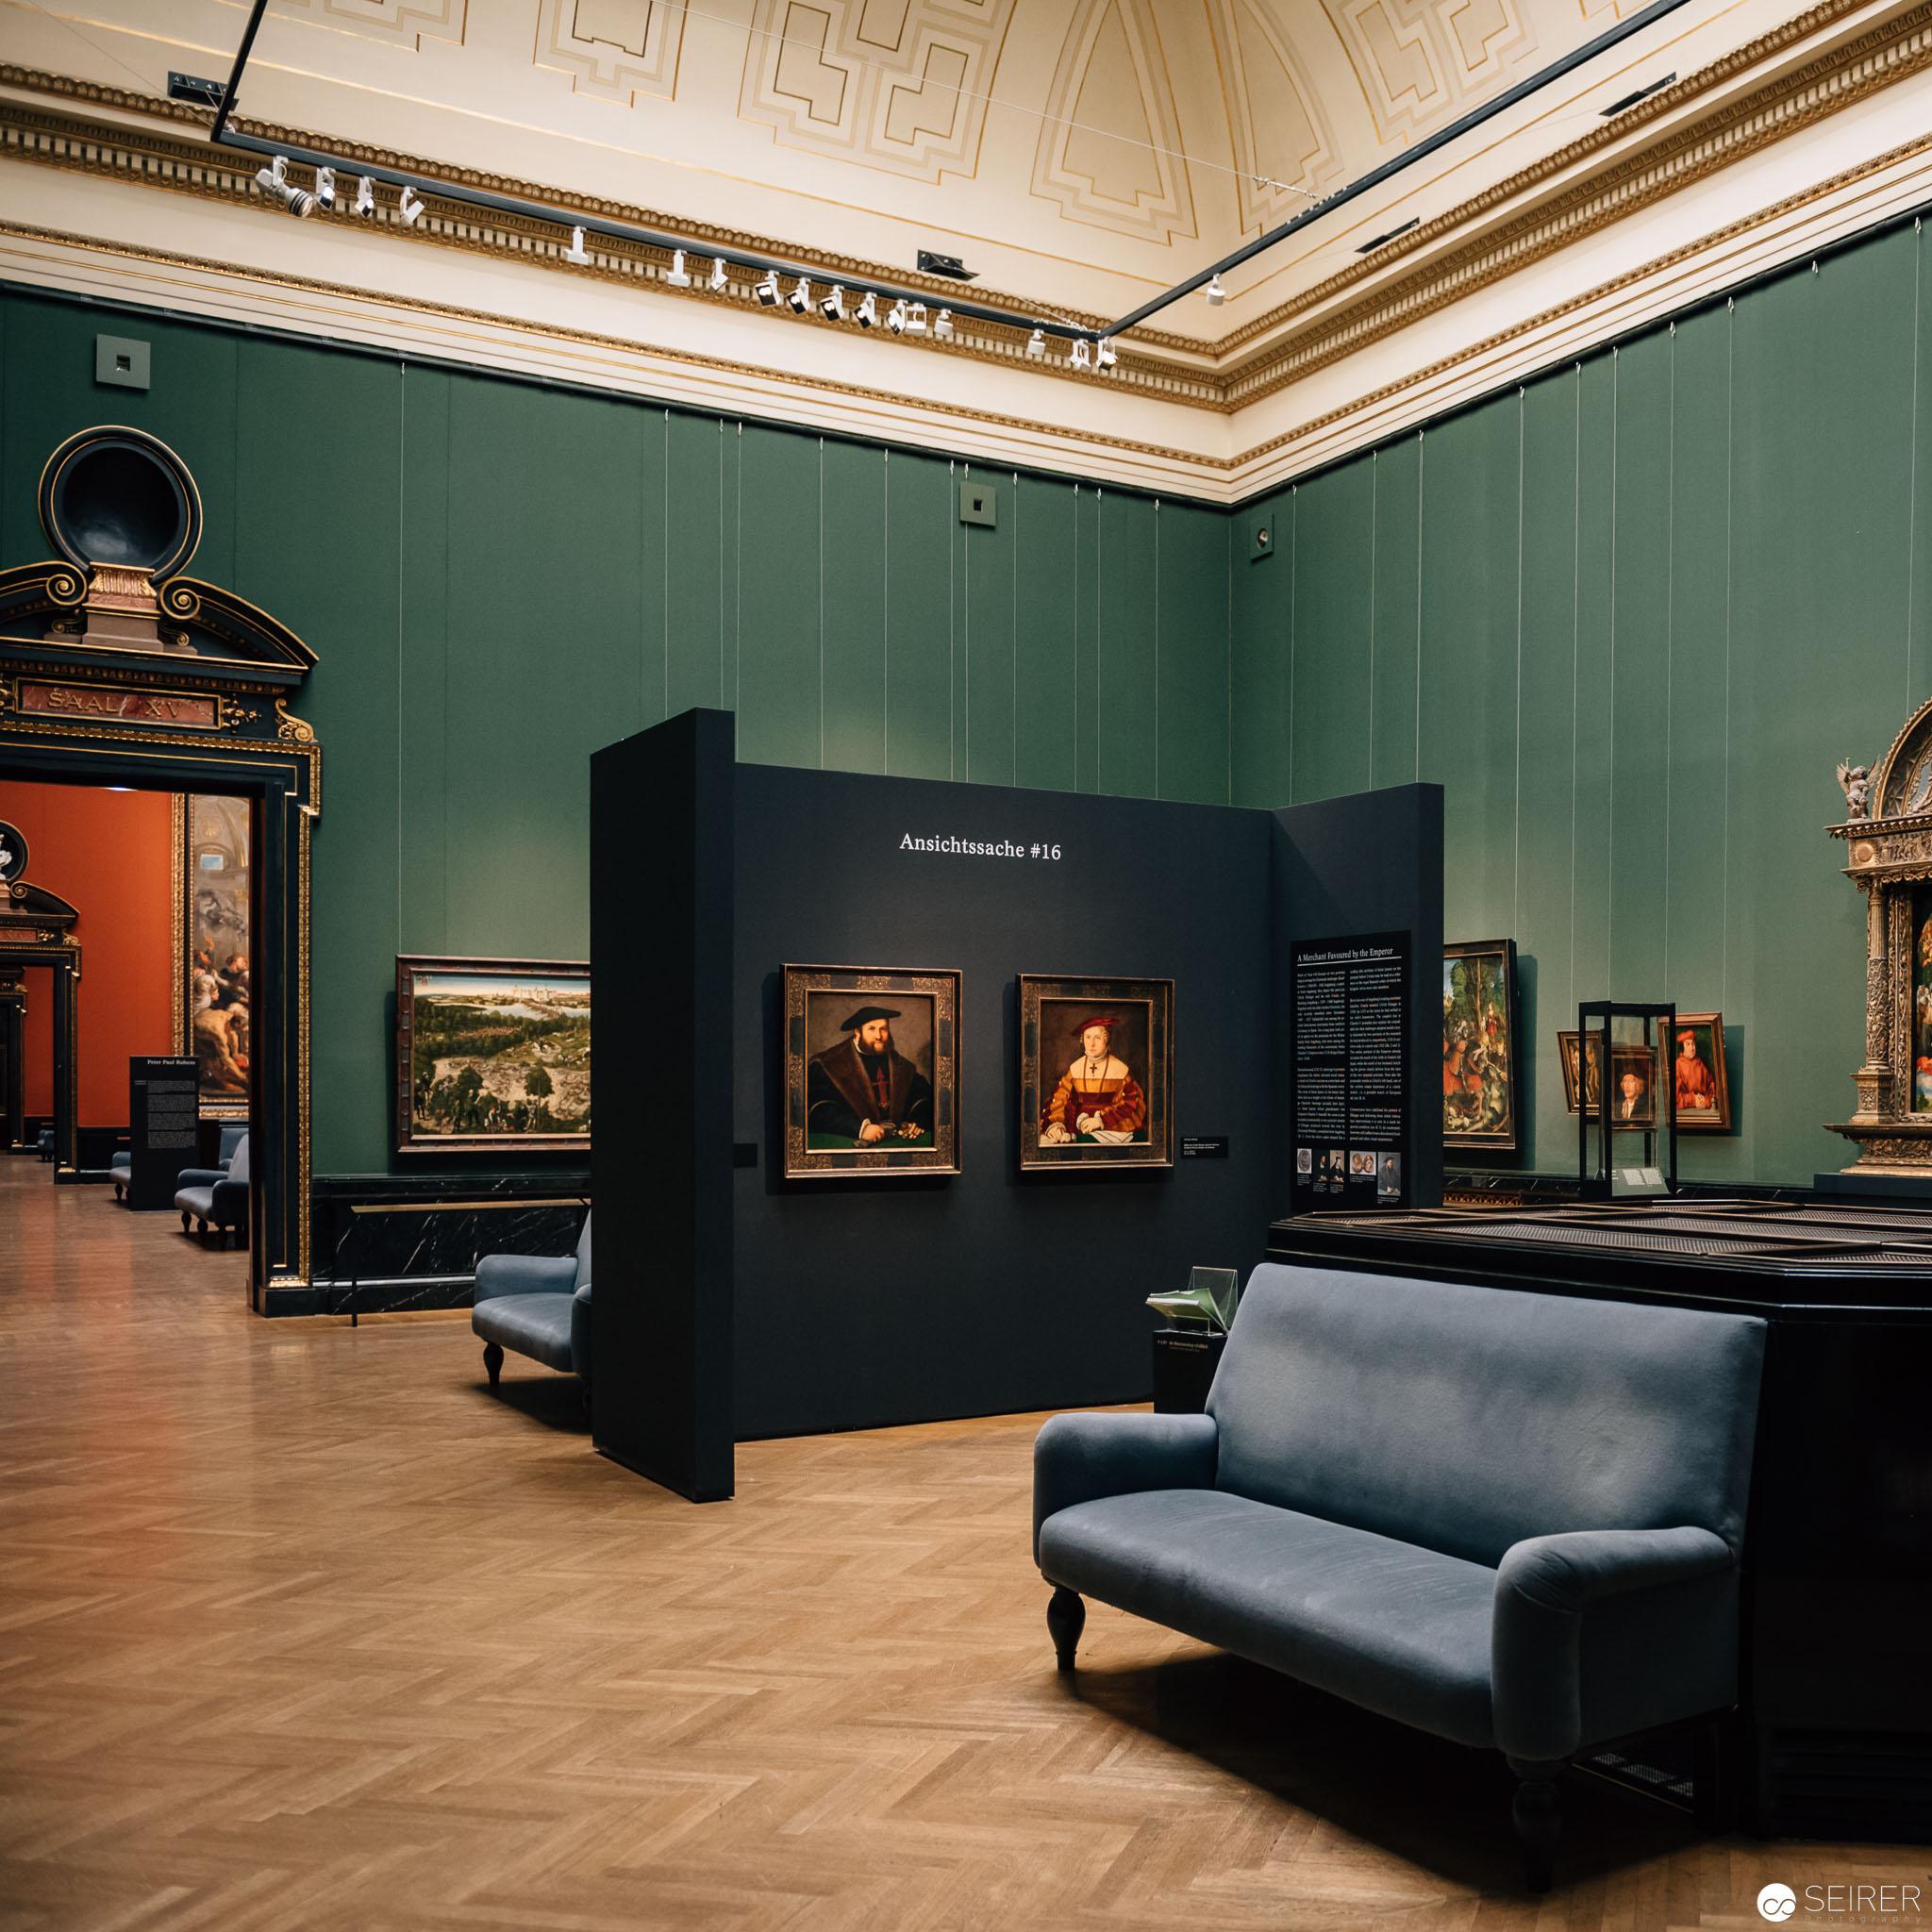 2016-11-08_kunsthistorisches_museum_khm_0012.jpg